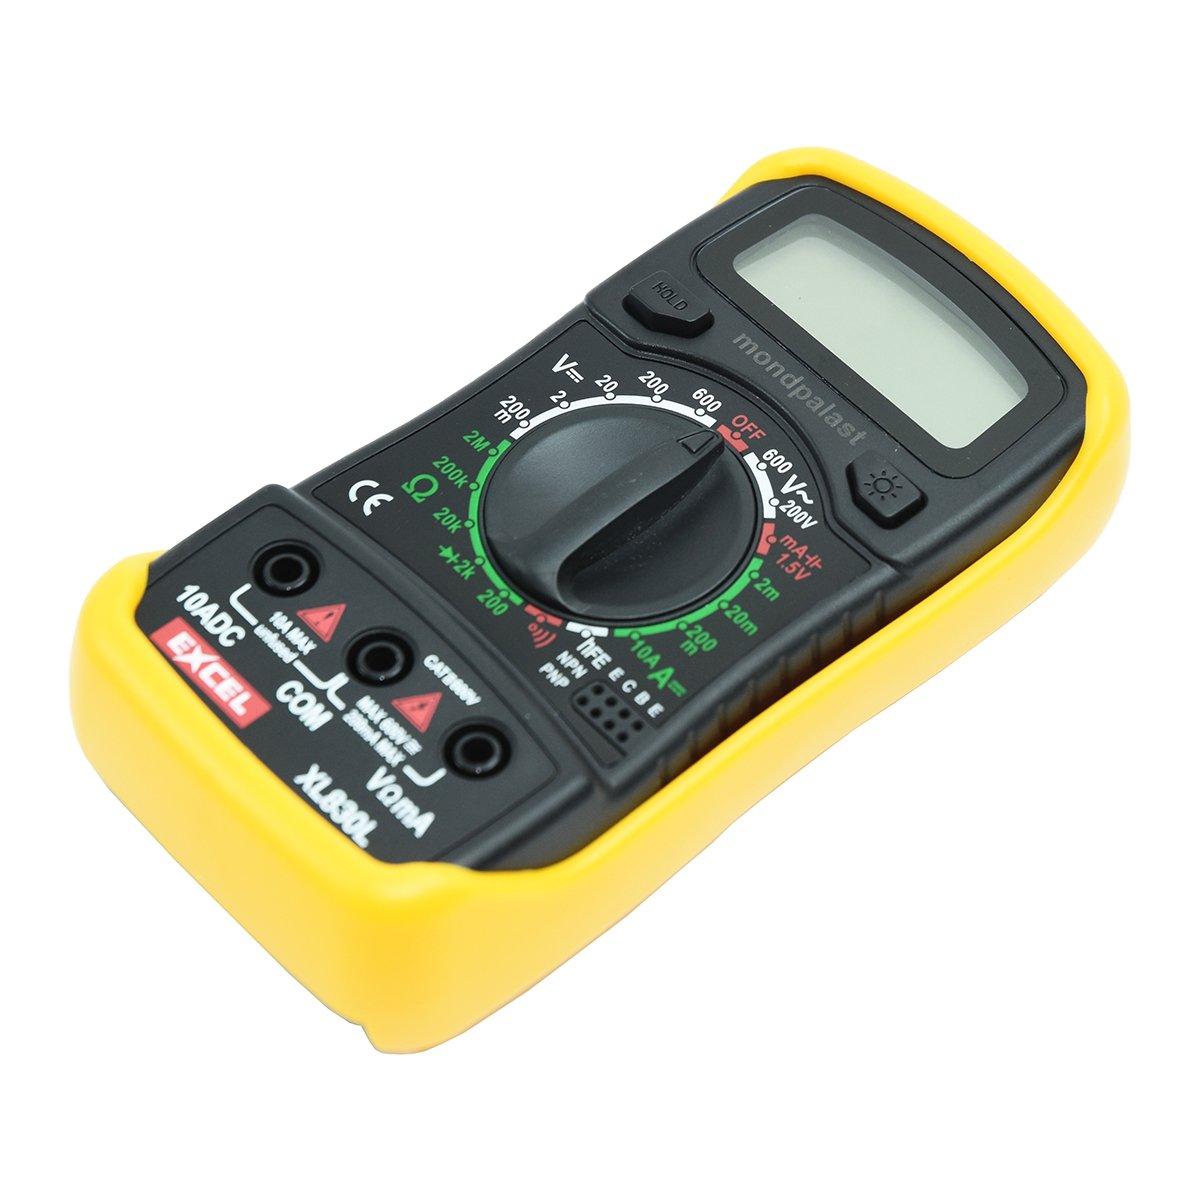 Multim/ètre Digital LCD Voltm/ètre Ohmm/ètre Amp/èrem/ètre 2 Cordons